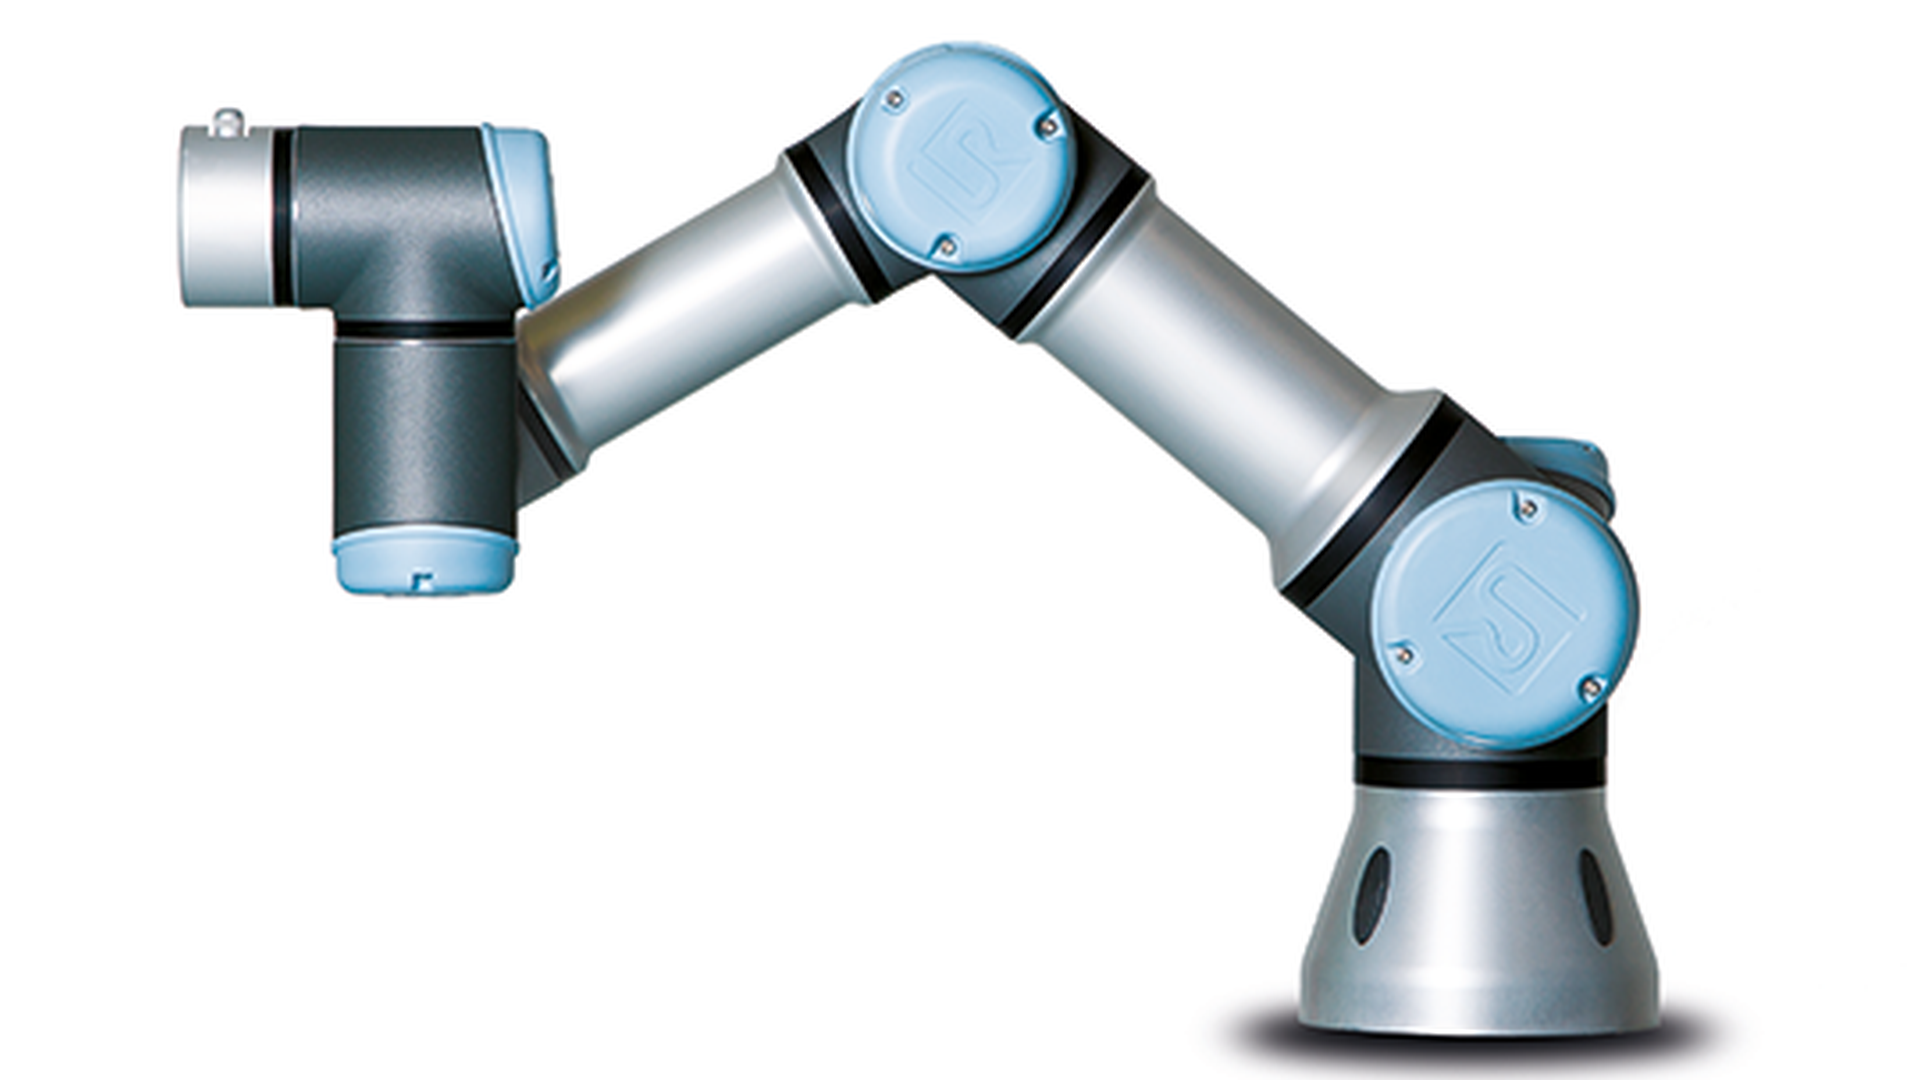 Brabant Robot Challenge in Natlab Strijp-S